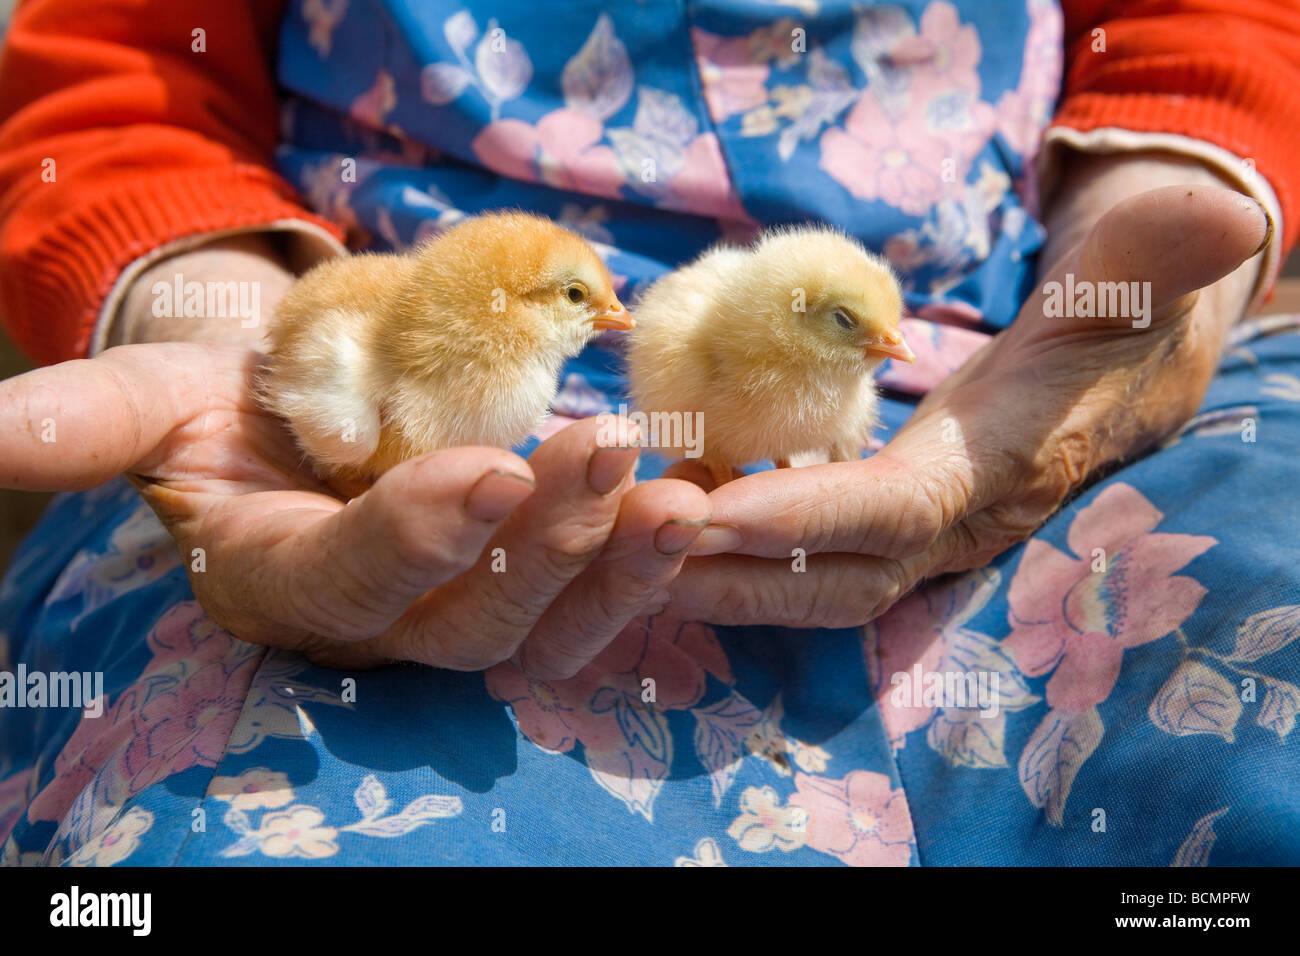 alte Bäuerin Huhn in ihren faltigen Händen hält Stockbild